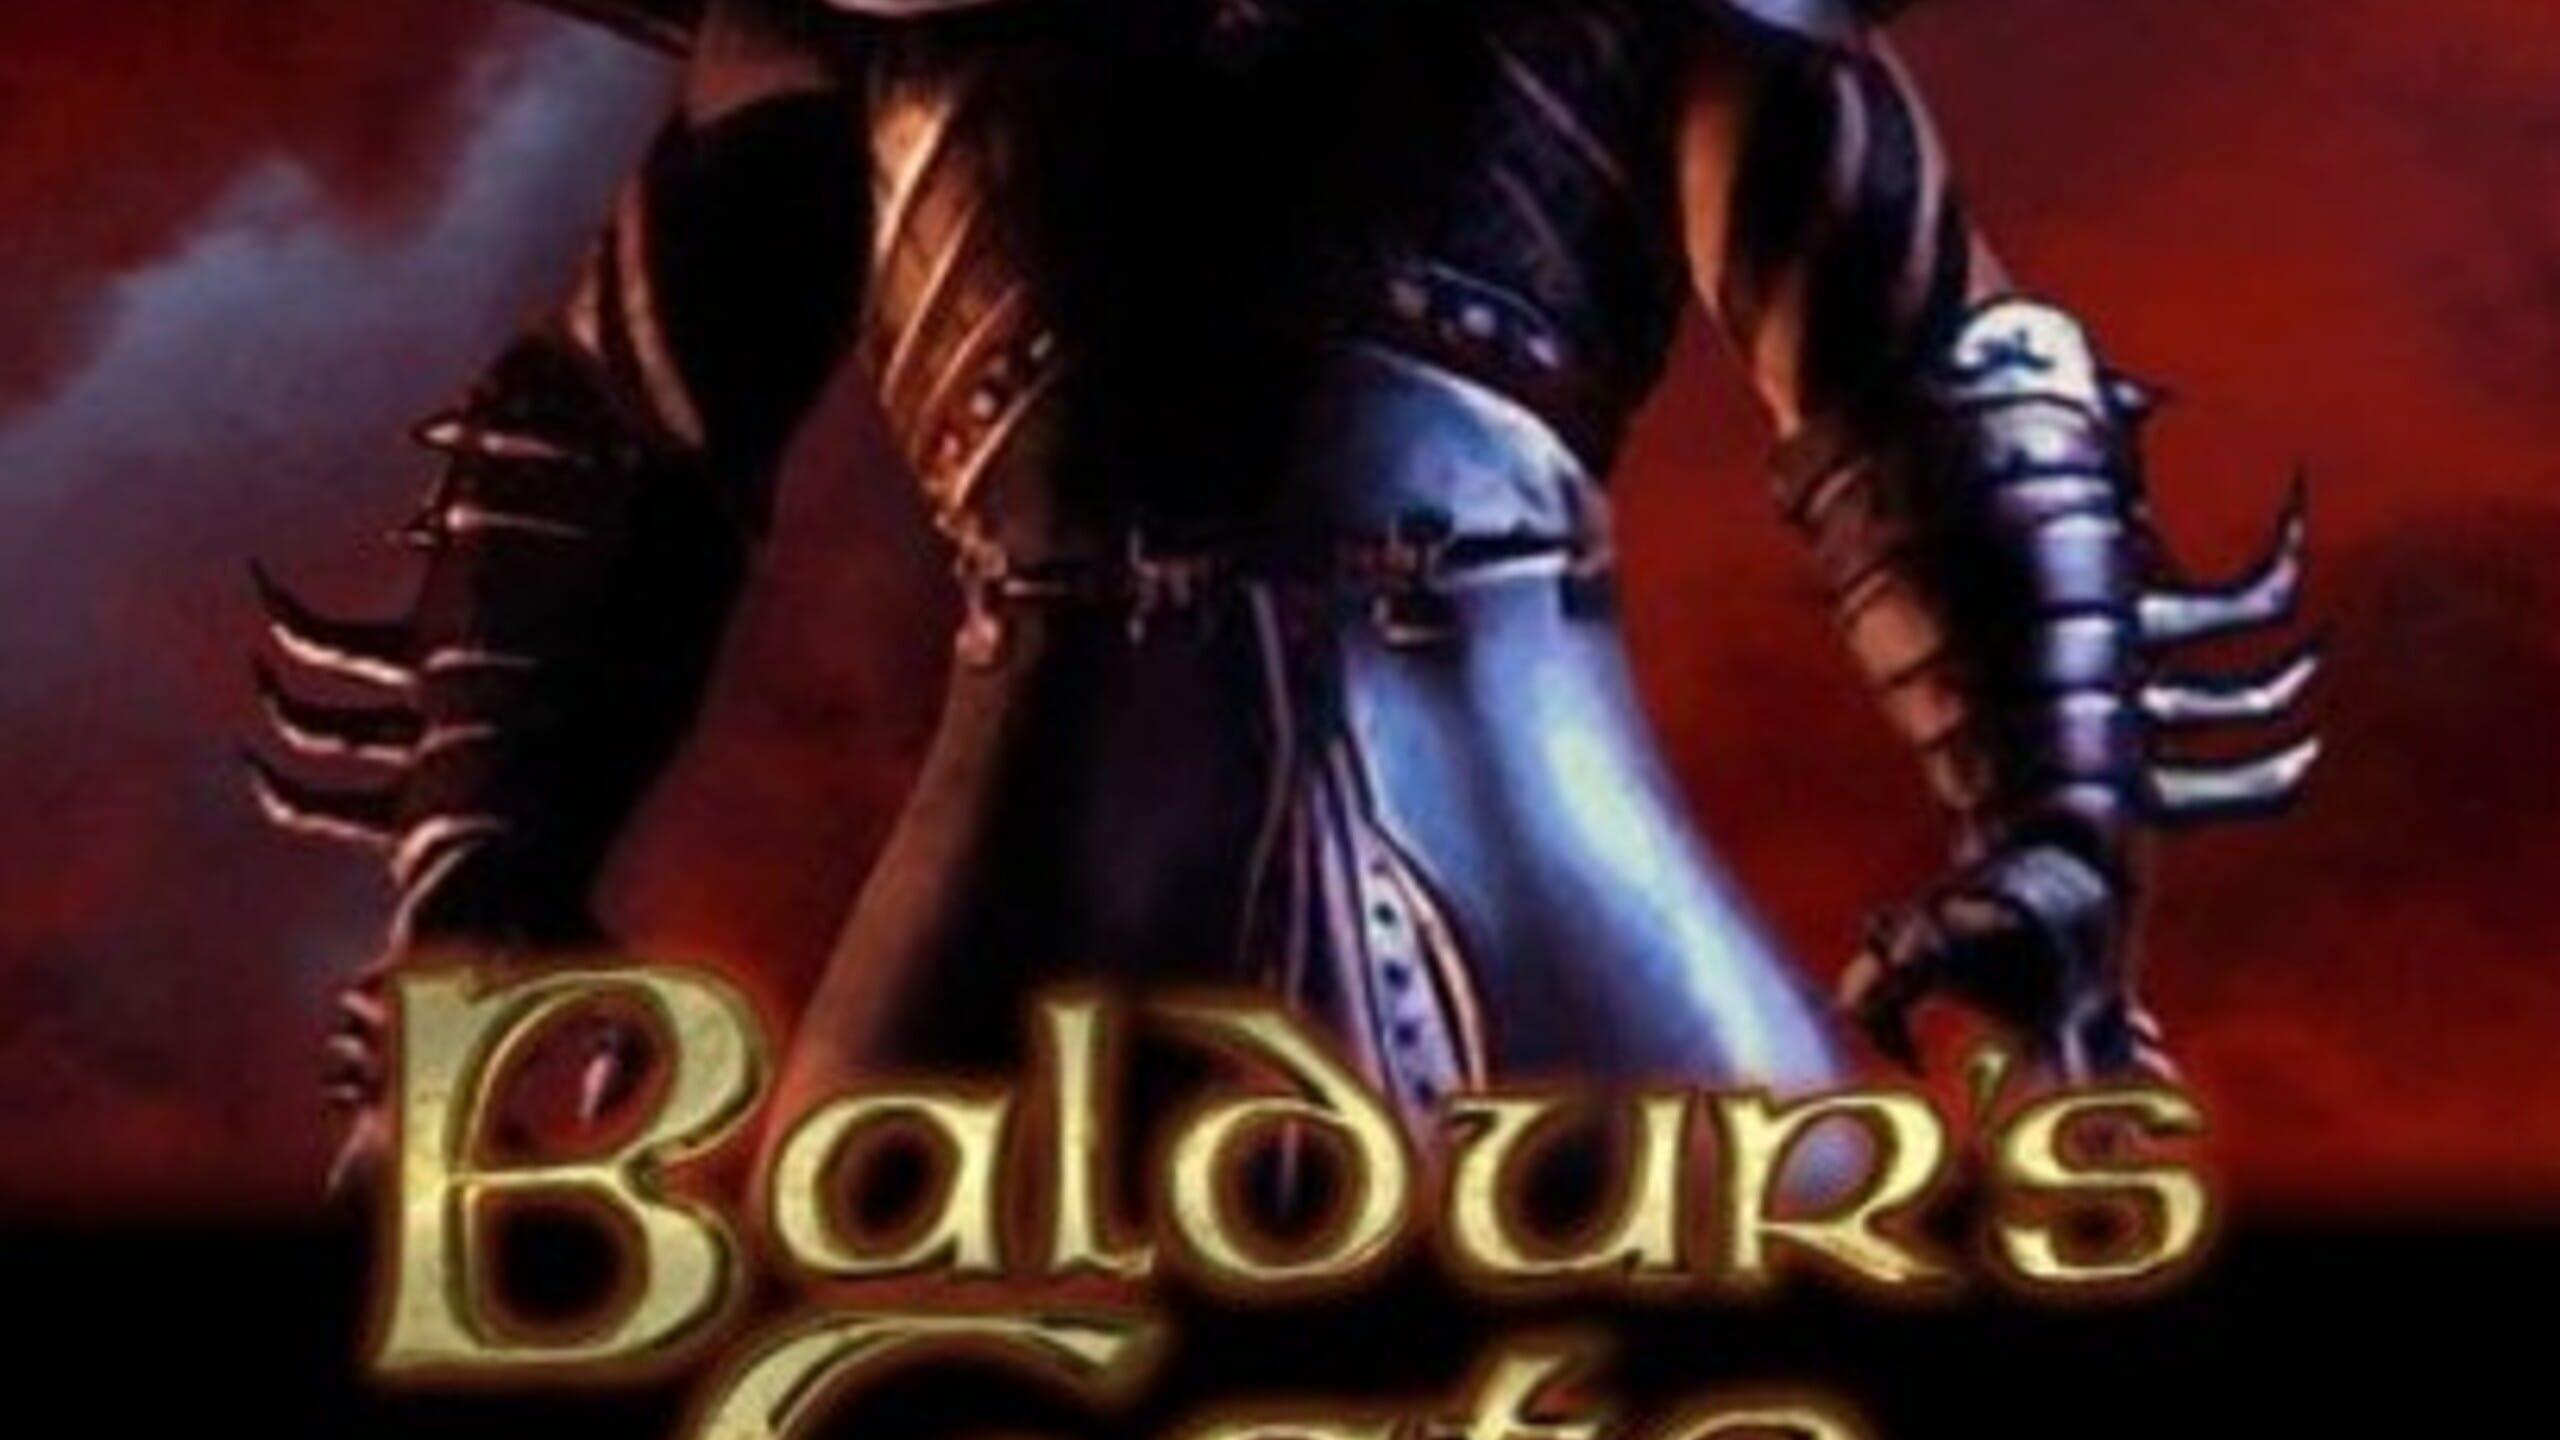 game cover art for Baldur's Gate: Enhanced Edition